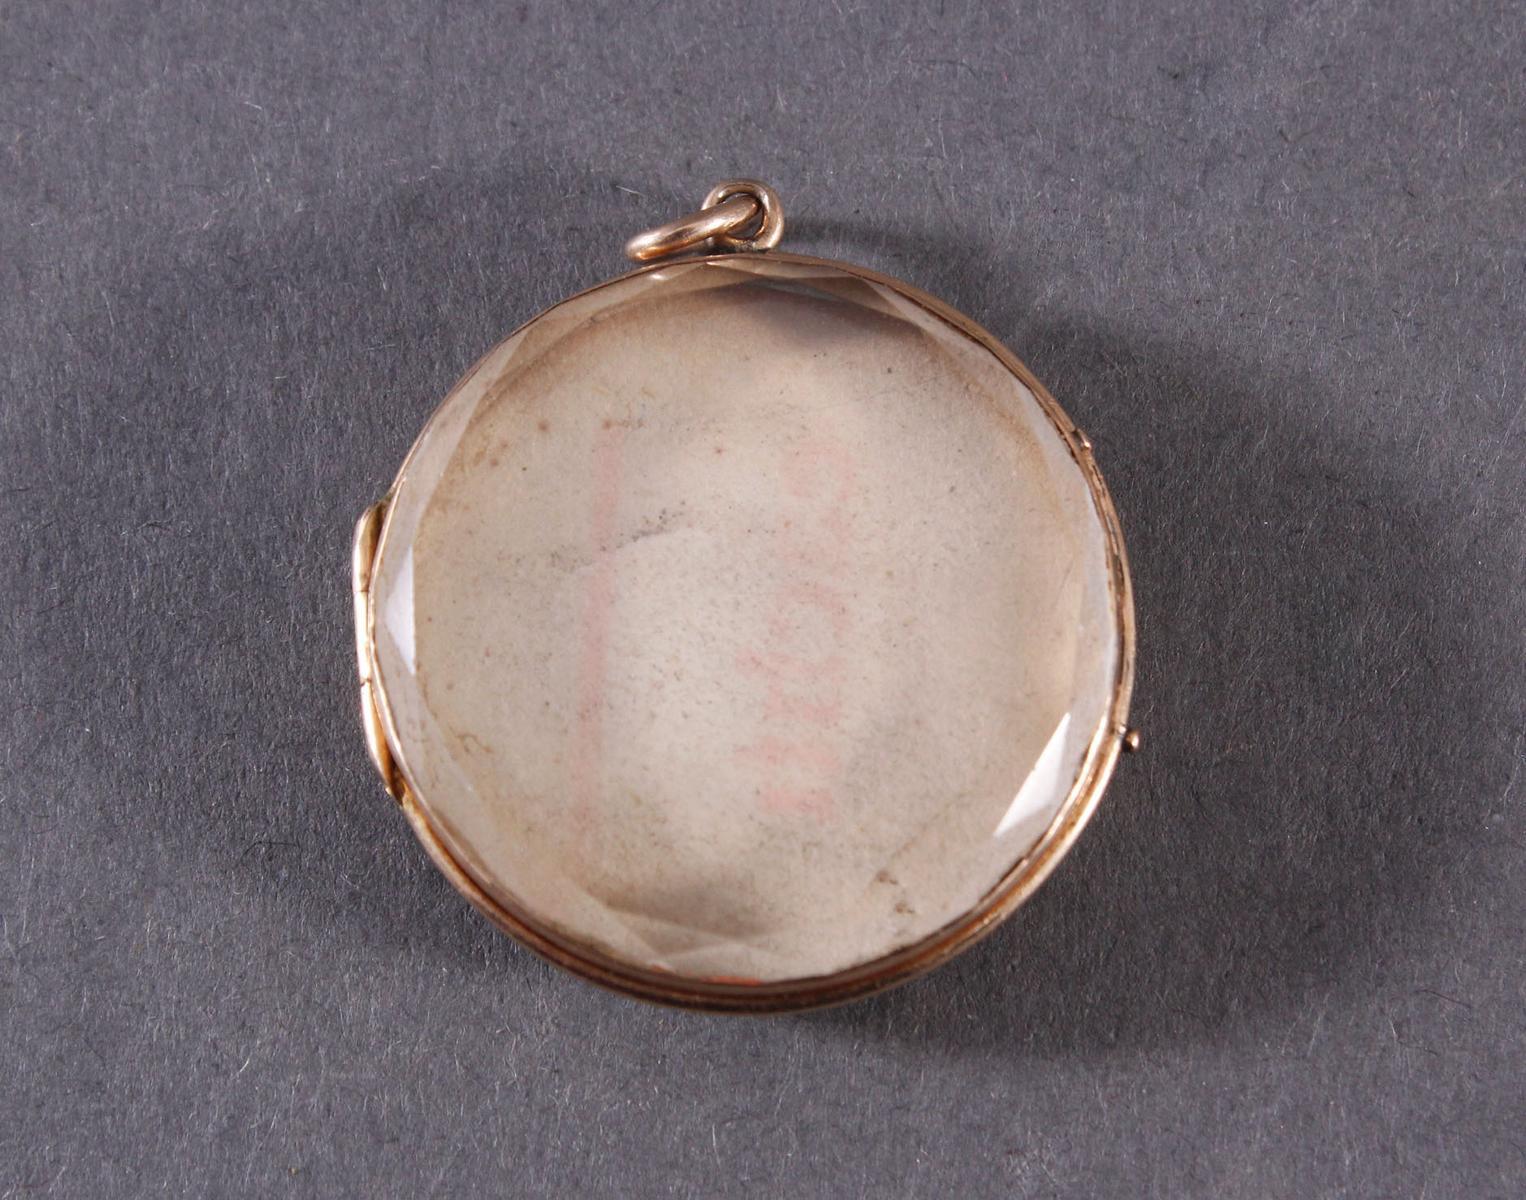 Rundes Medaillon um 1900, 18 kt Gelbgold-2